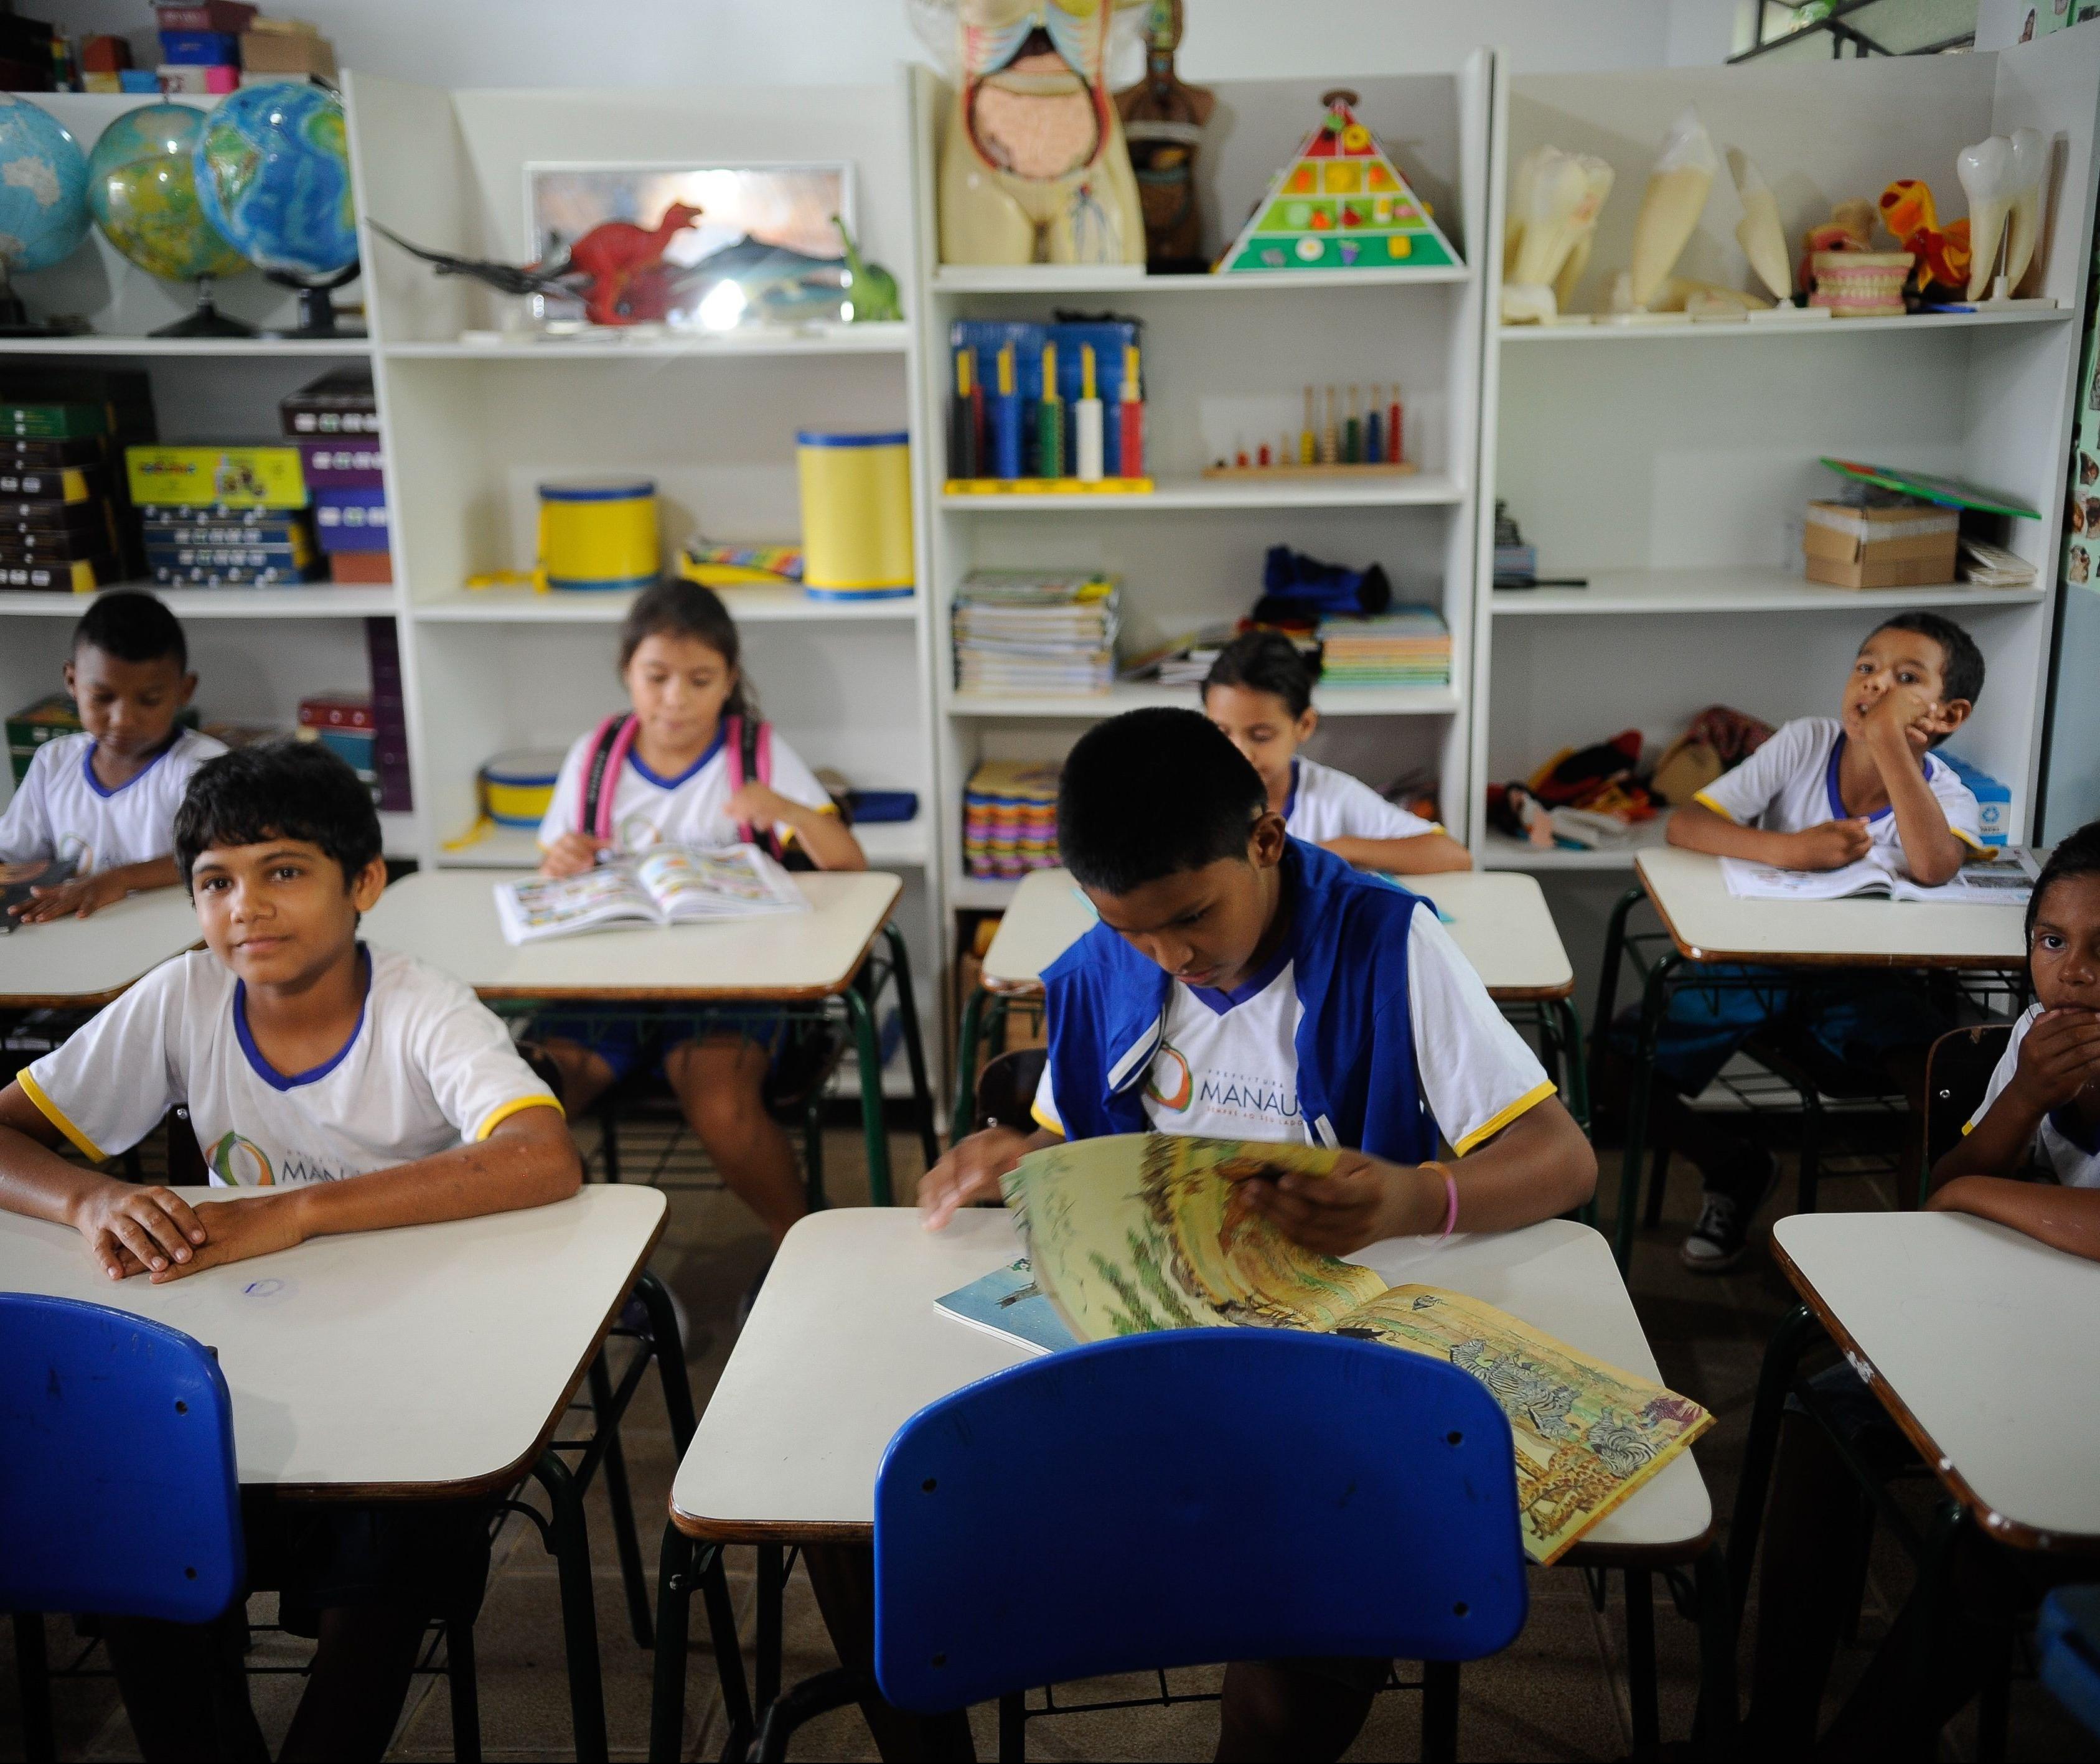 Escola pública encolhe